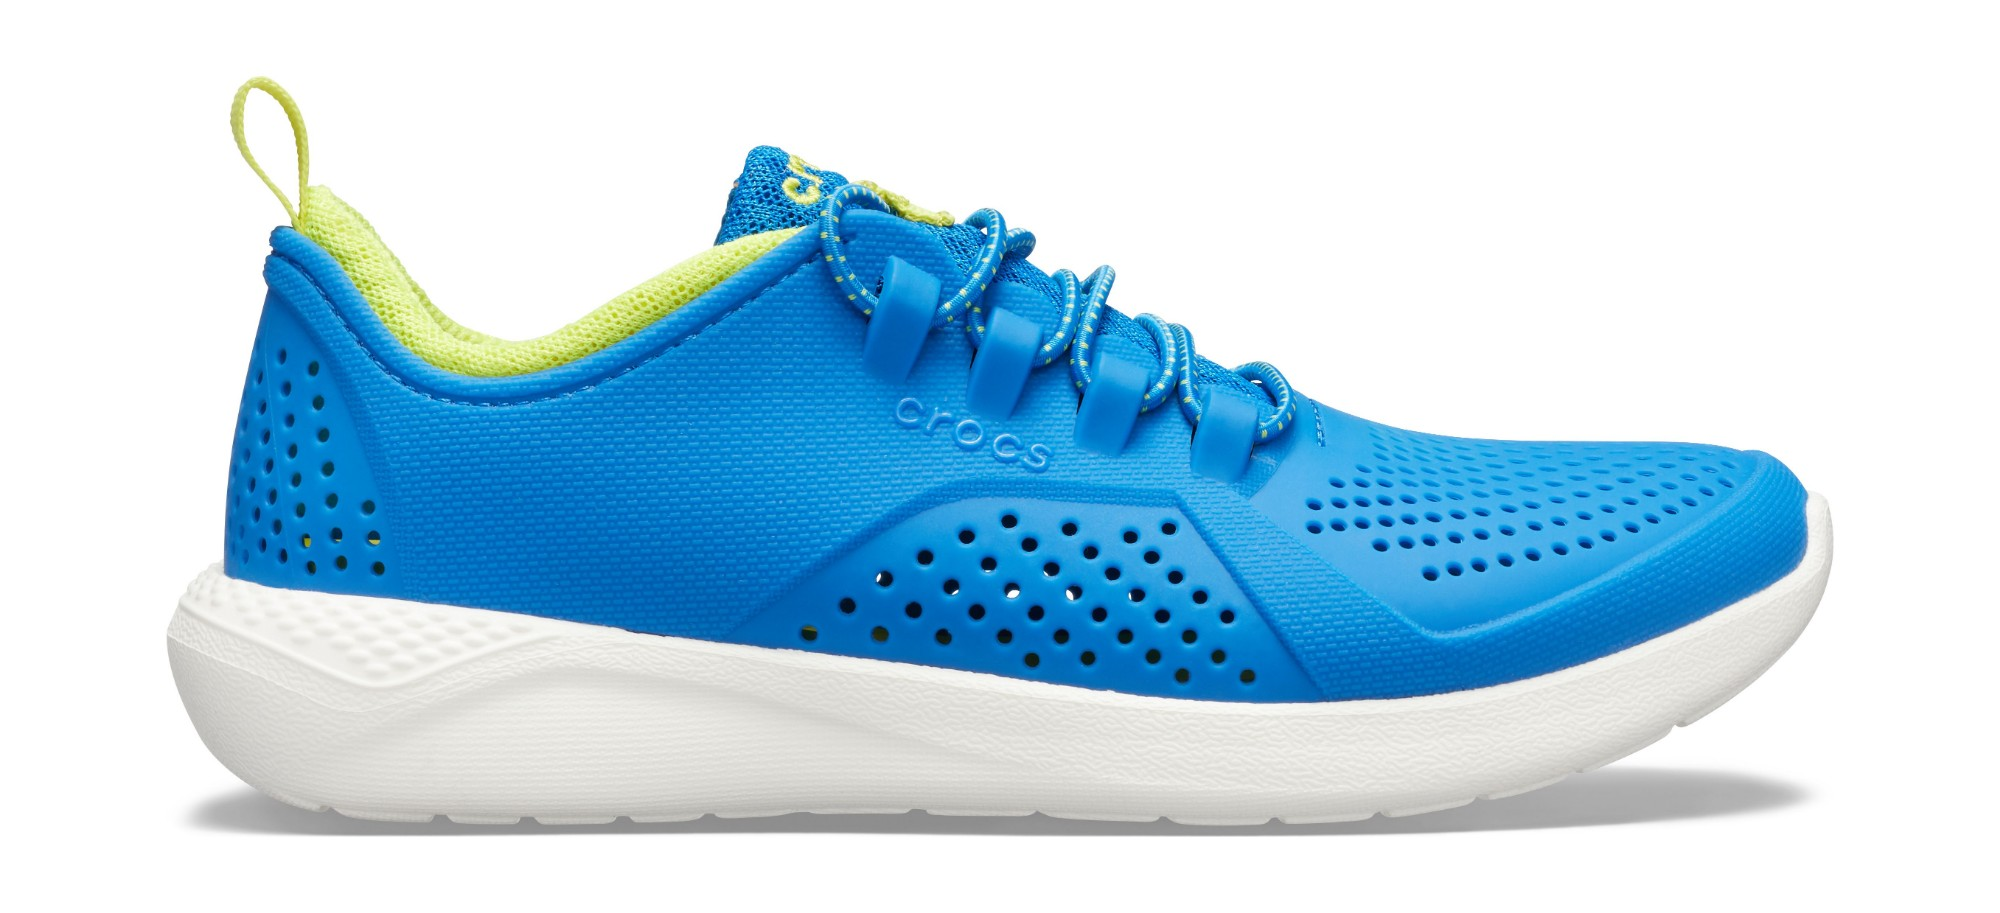 Crocs™ LiteRide Pacer Kid's Bright Cobalt/Citrus 38,5